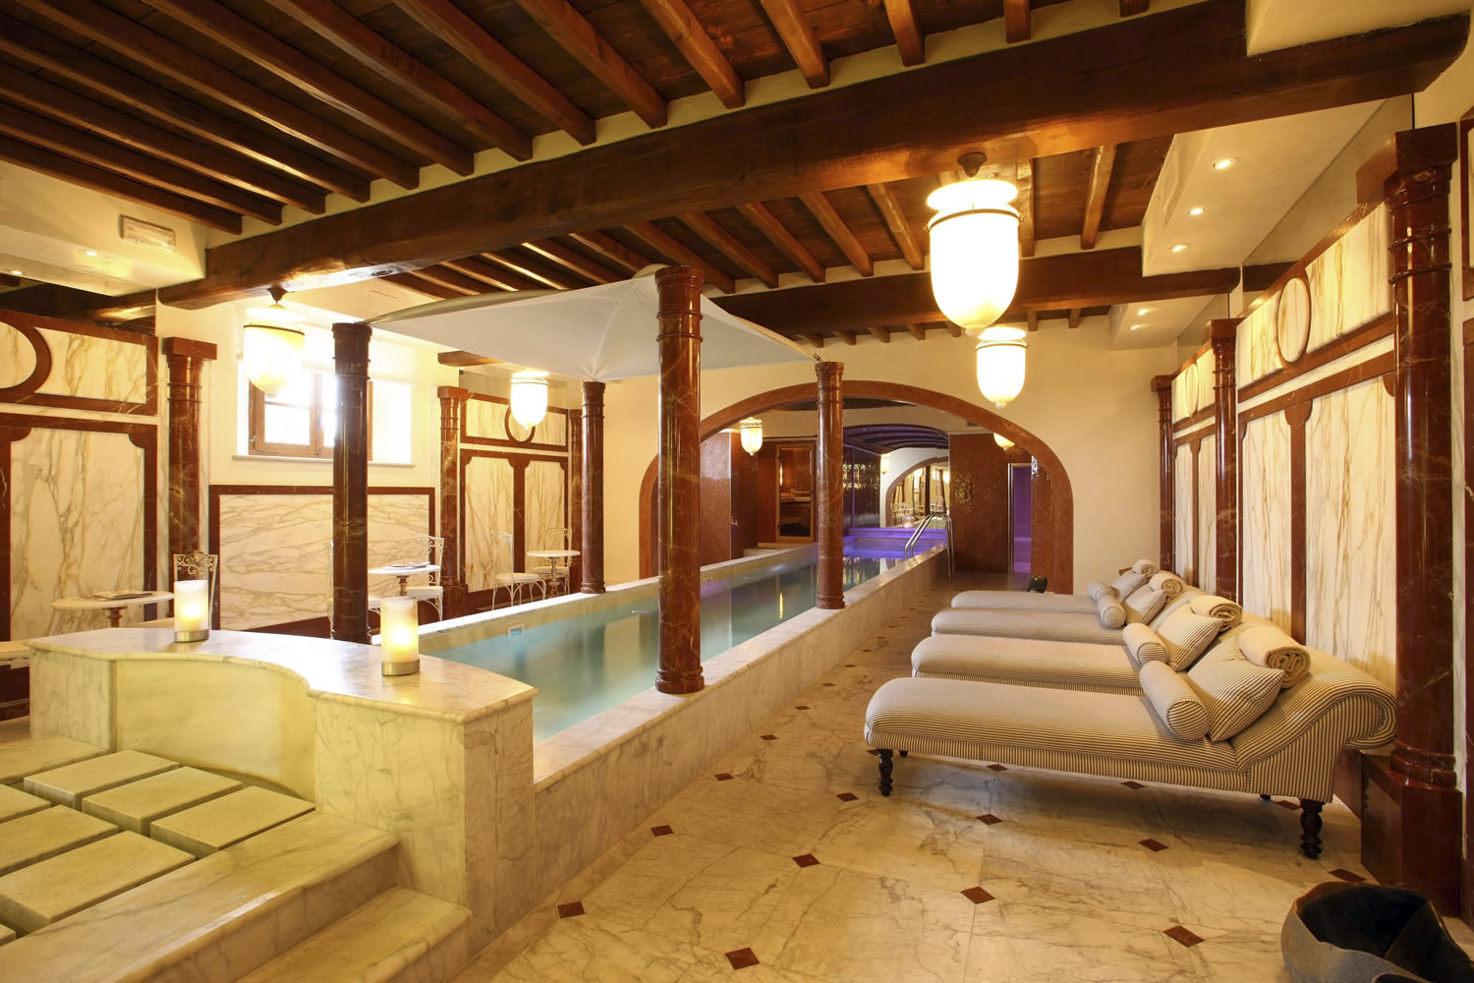 Villa Mangiacane spa and wellness